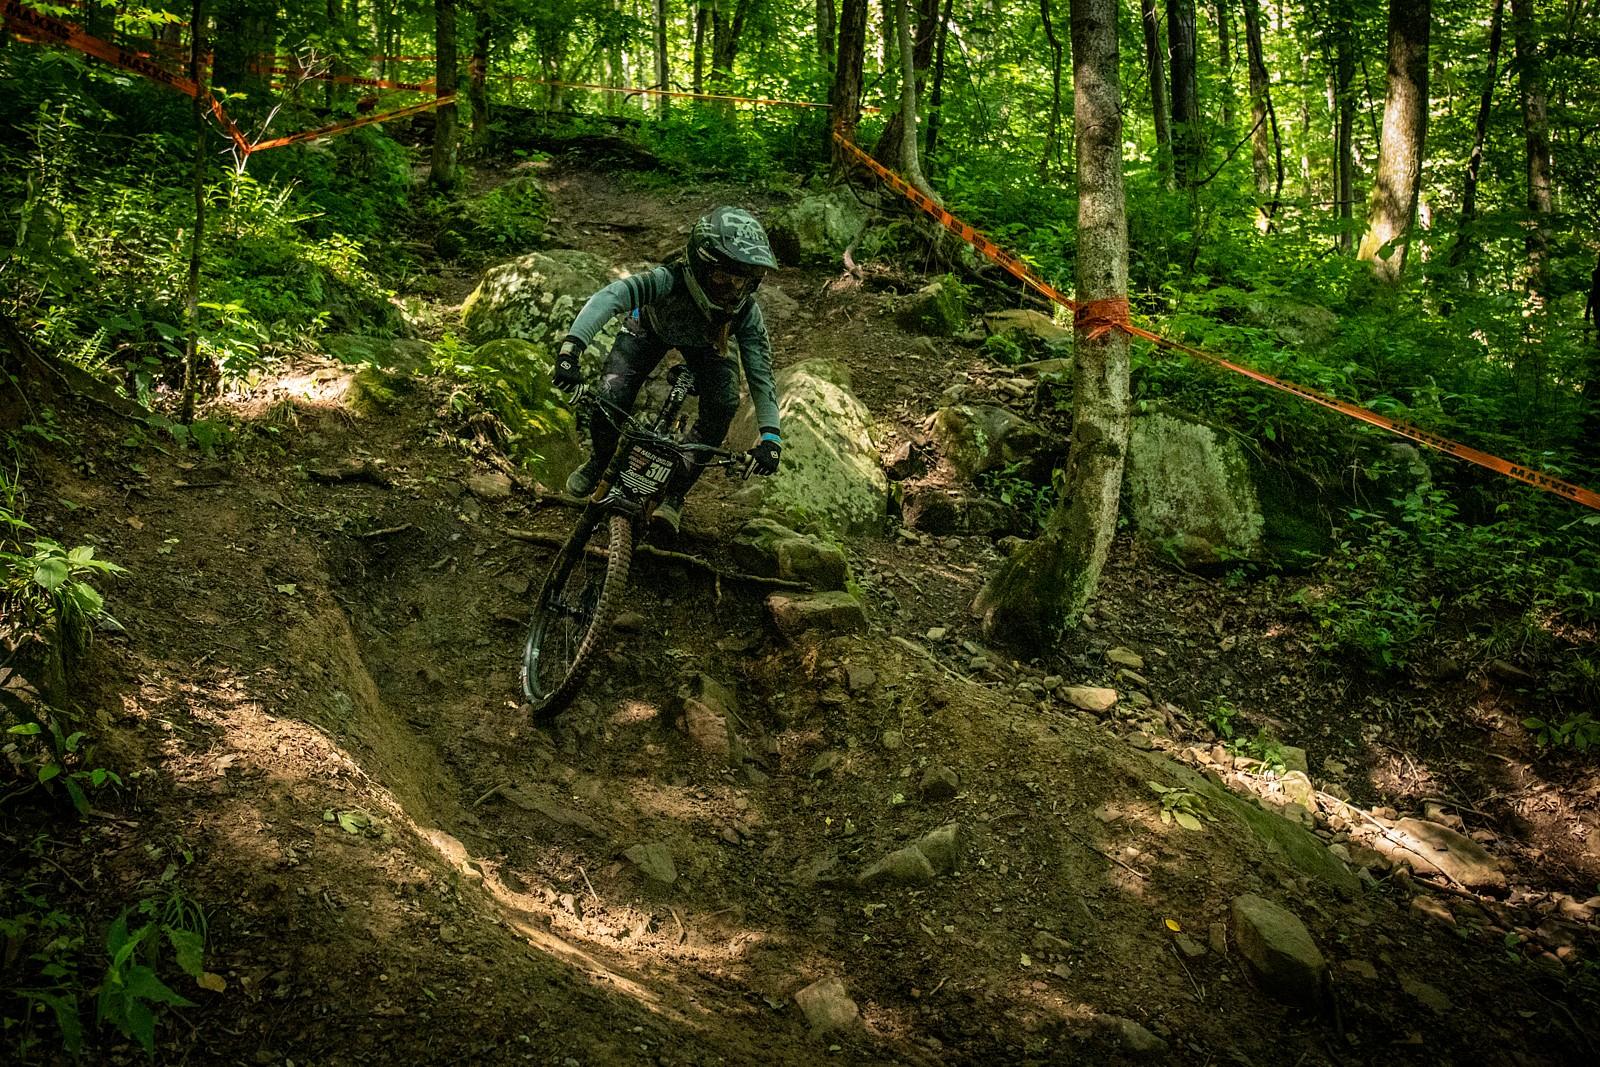 Kailey Skelton - JackRice - Mountain Biking Pictures - Vital MTB